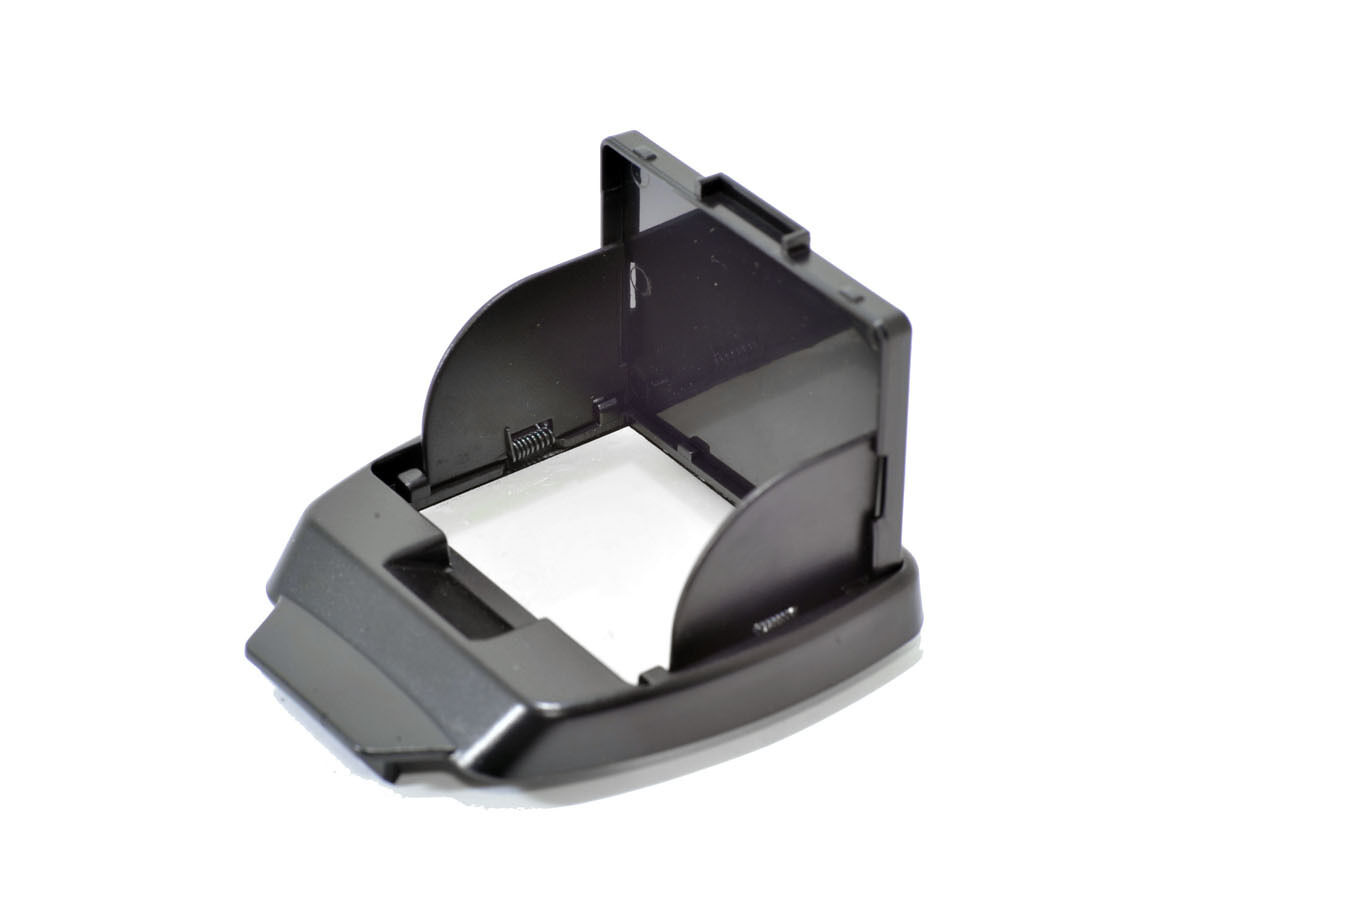 LCD Hood/Shade for Nikon D70S